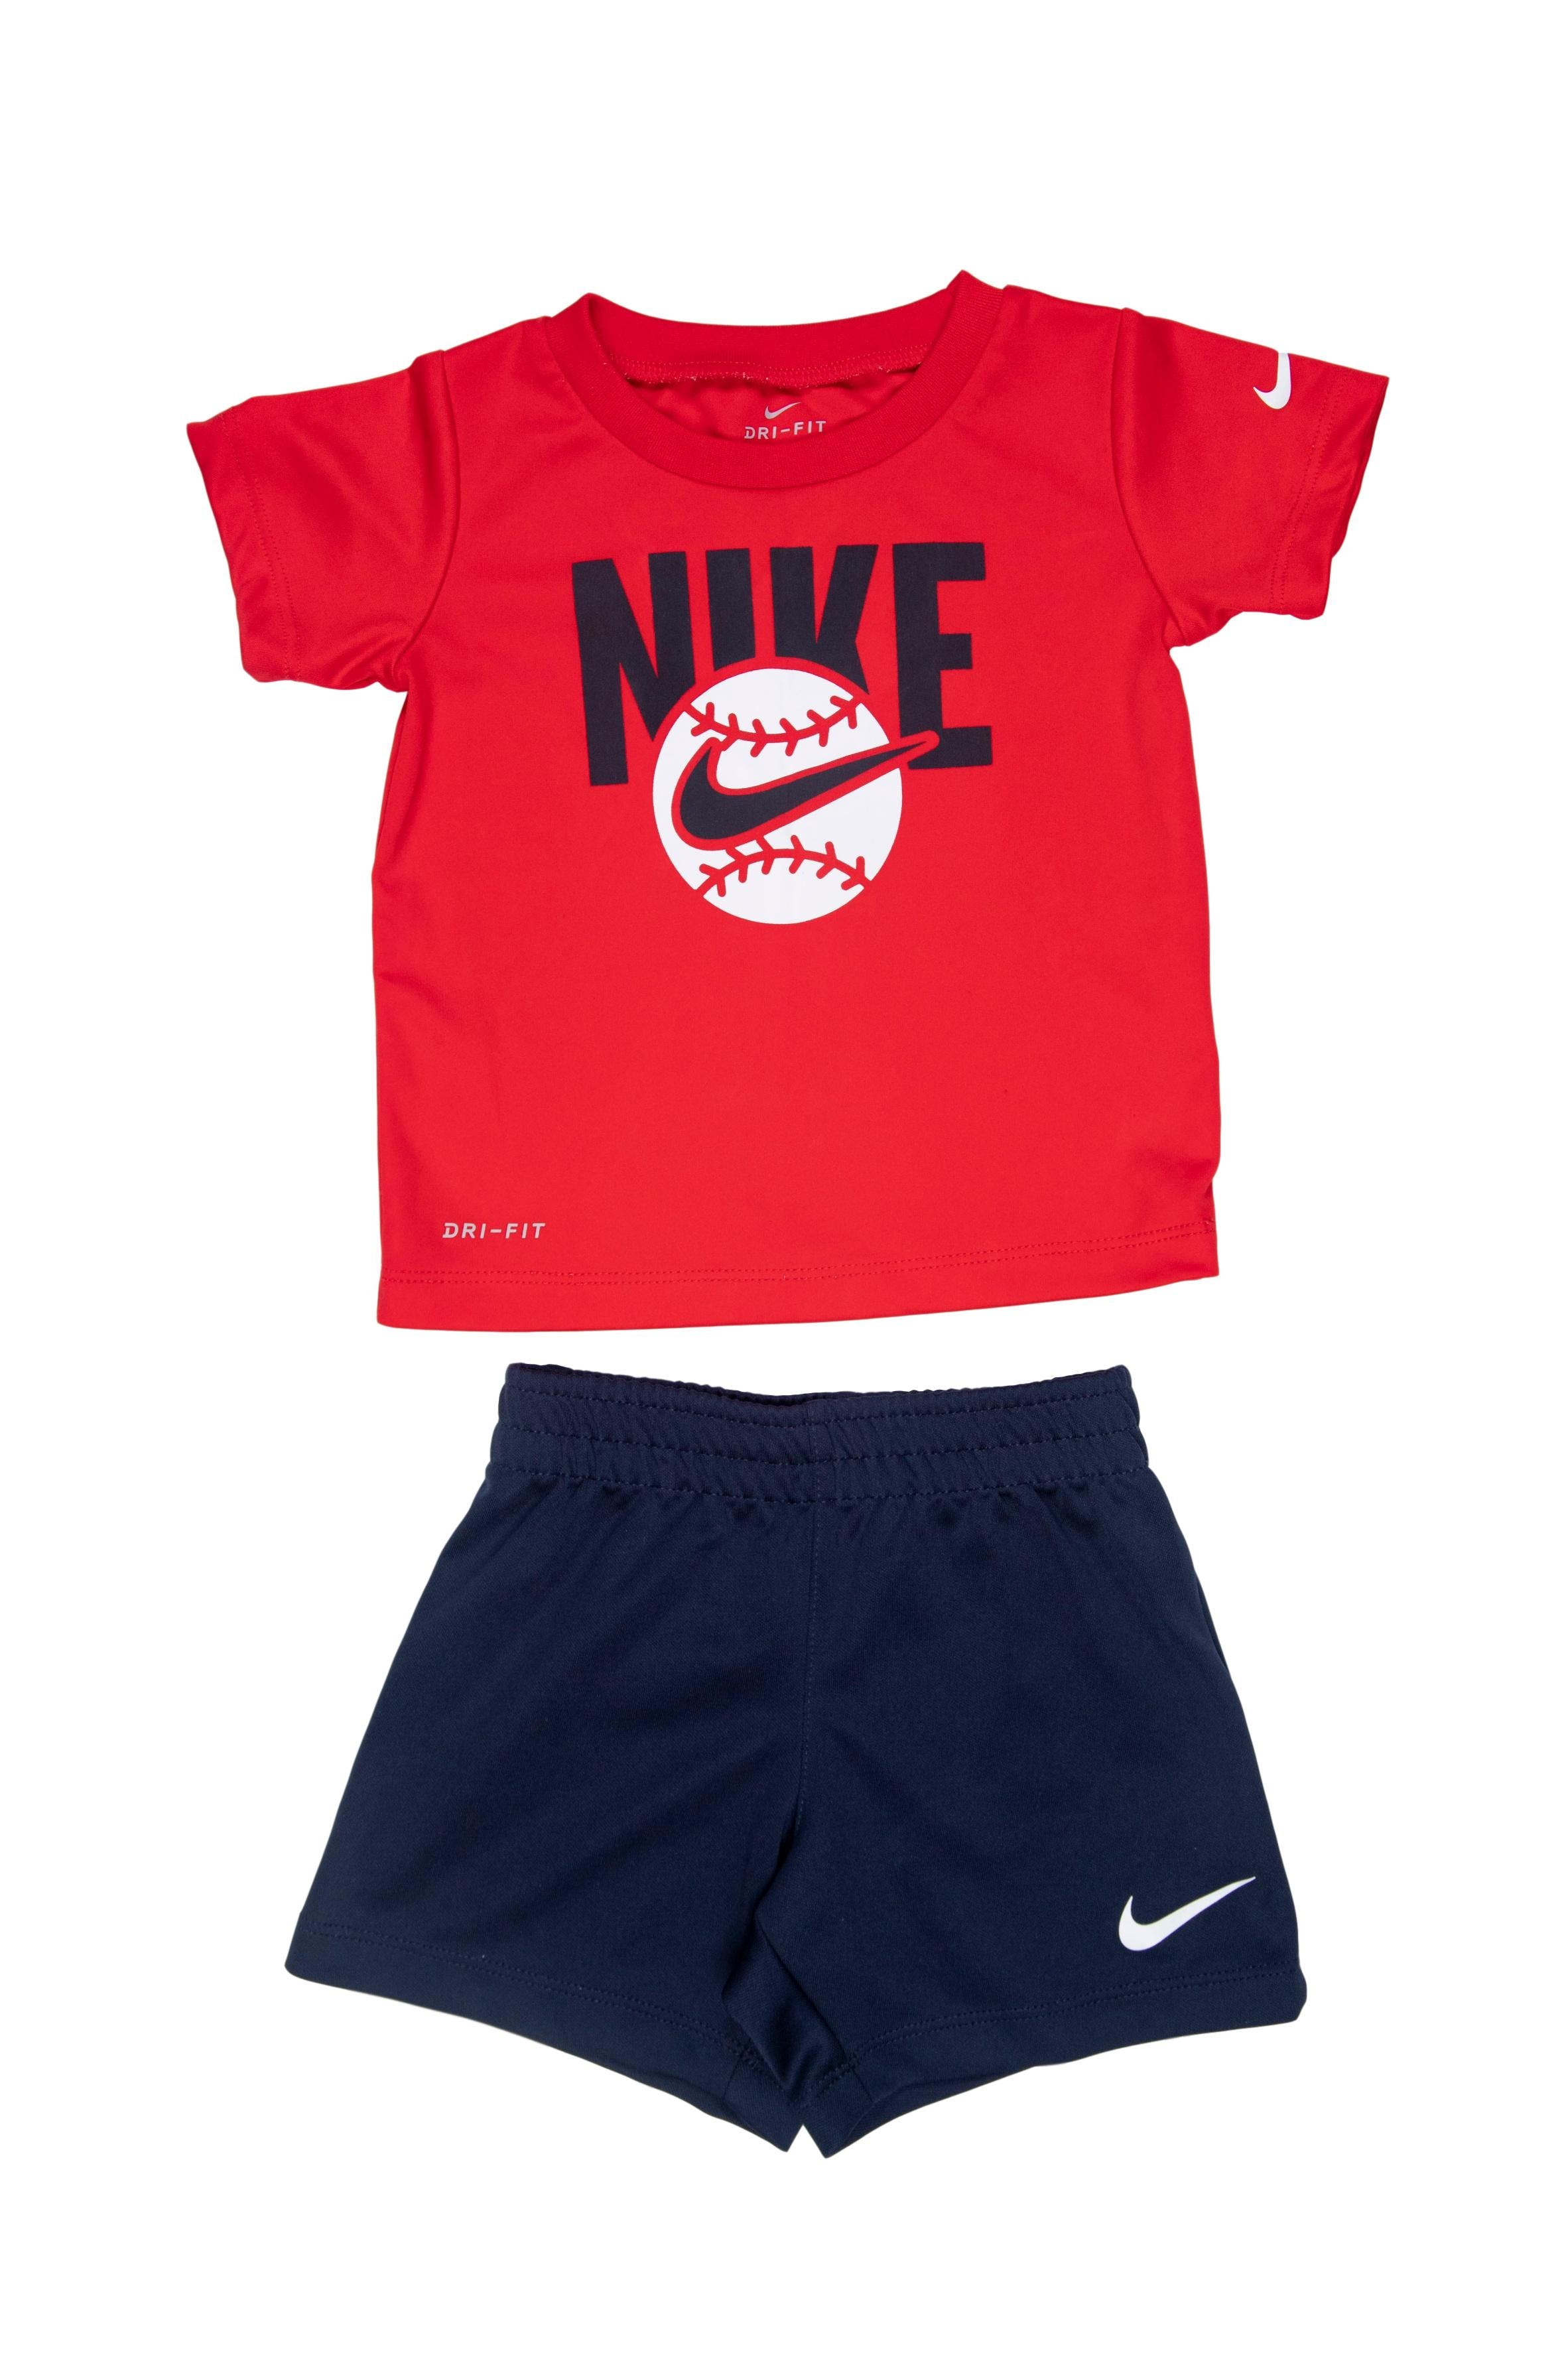 Conjunto Nke Polo rojo tela Dri - Fit y Short azúl marino. - Nike